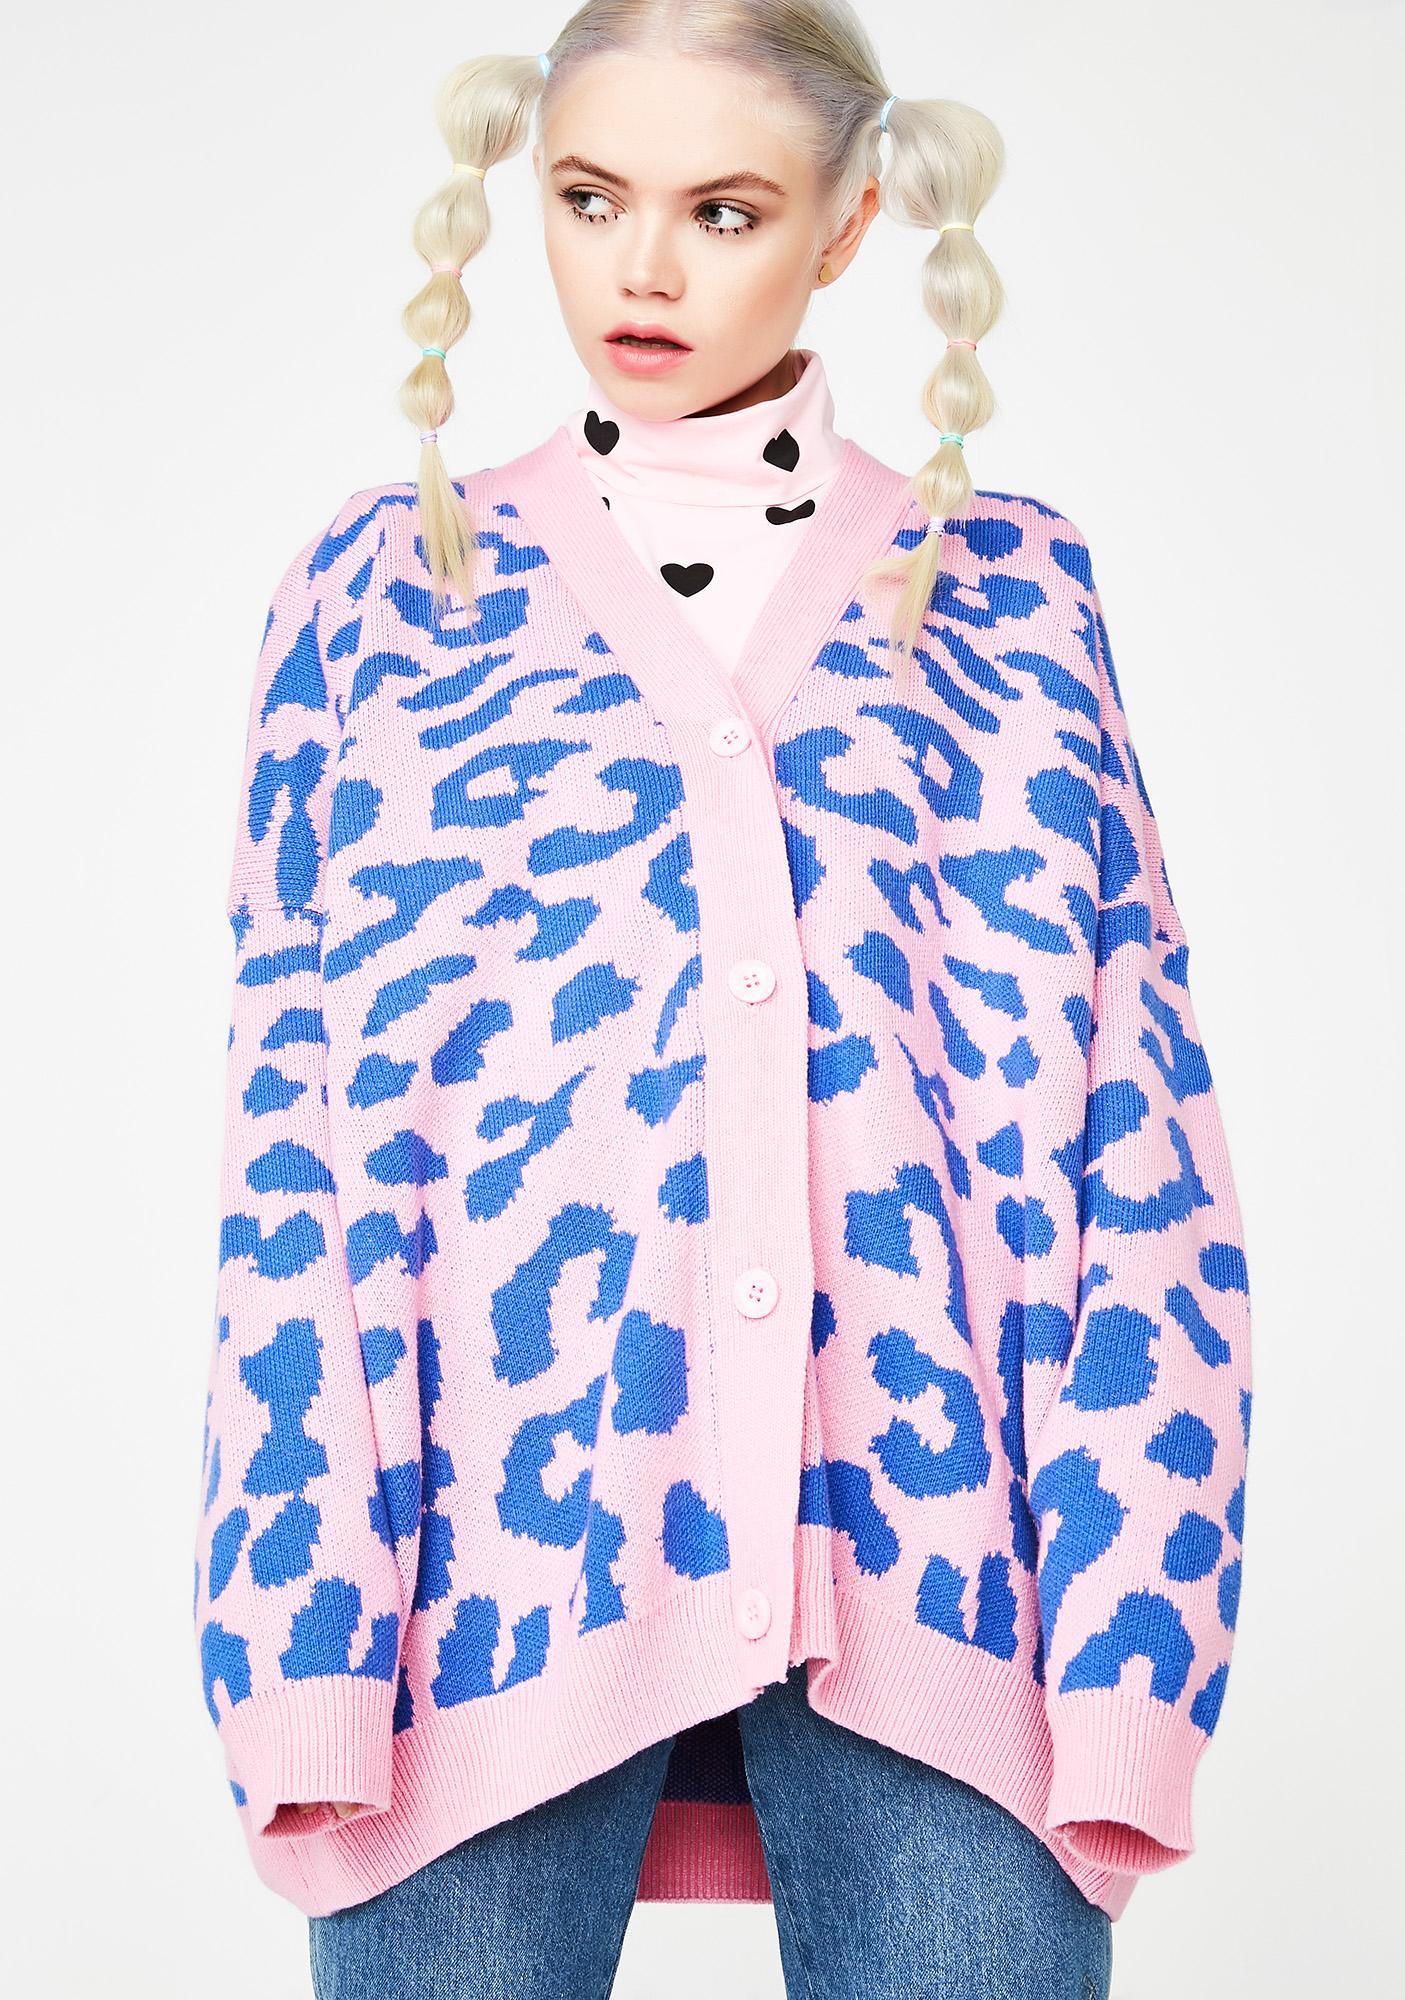 Lazy Oaf Pink Leopard Cardigan